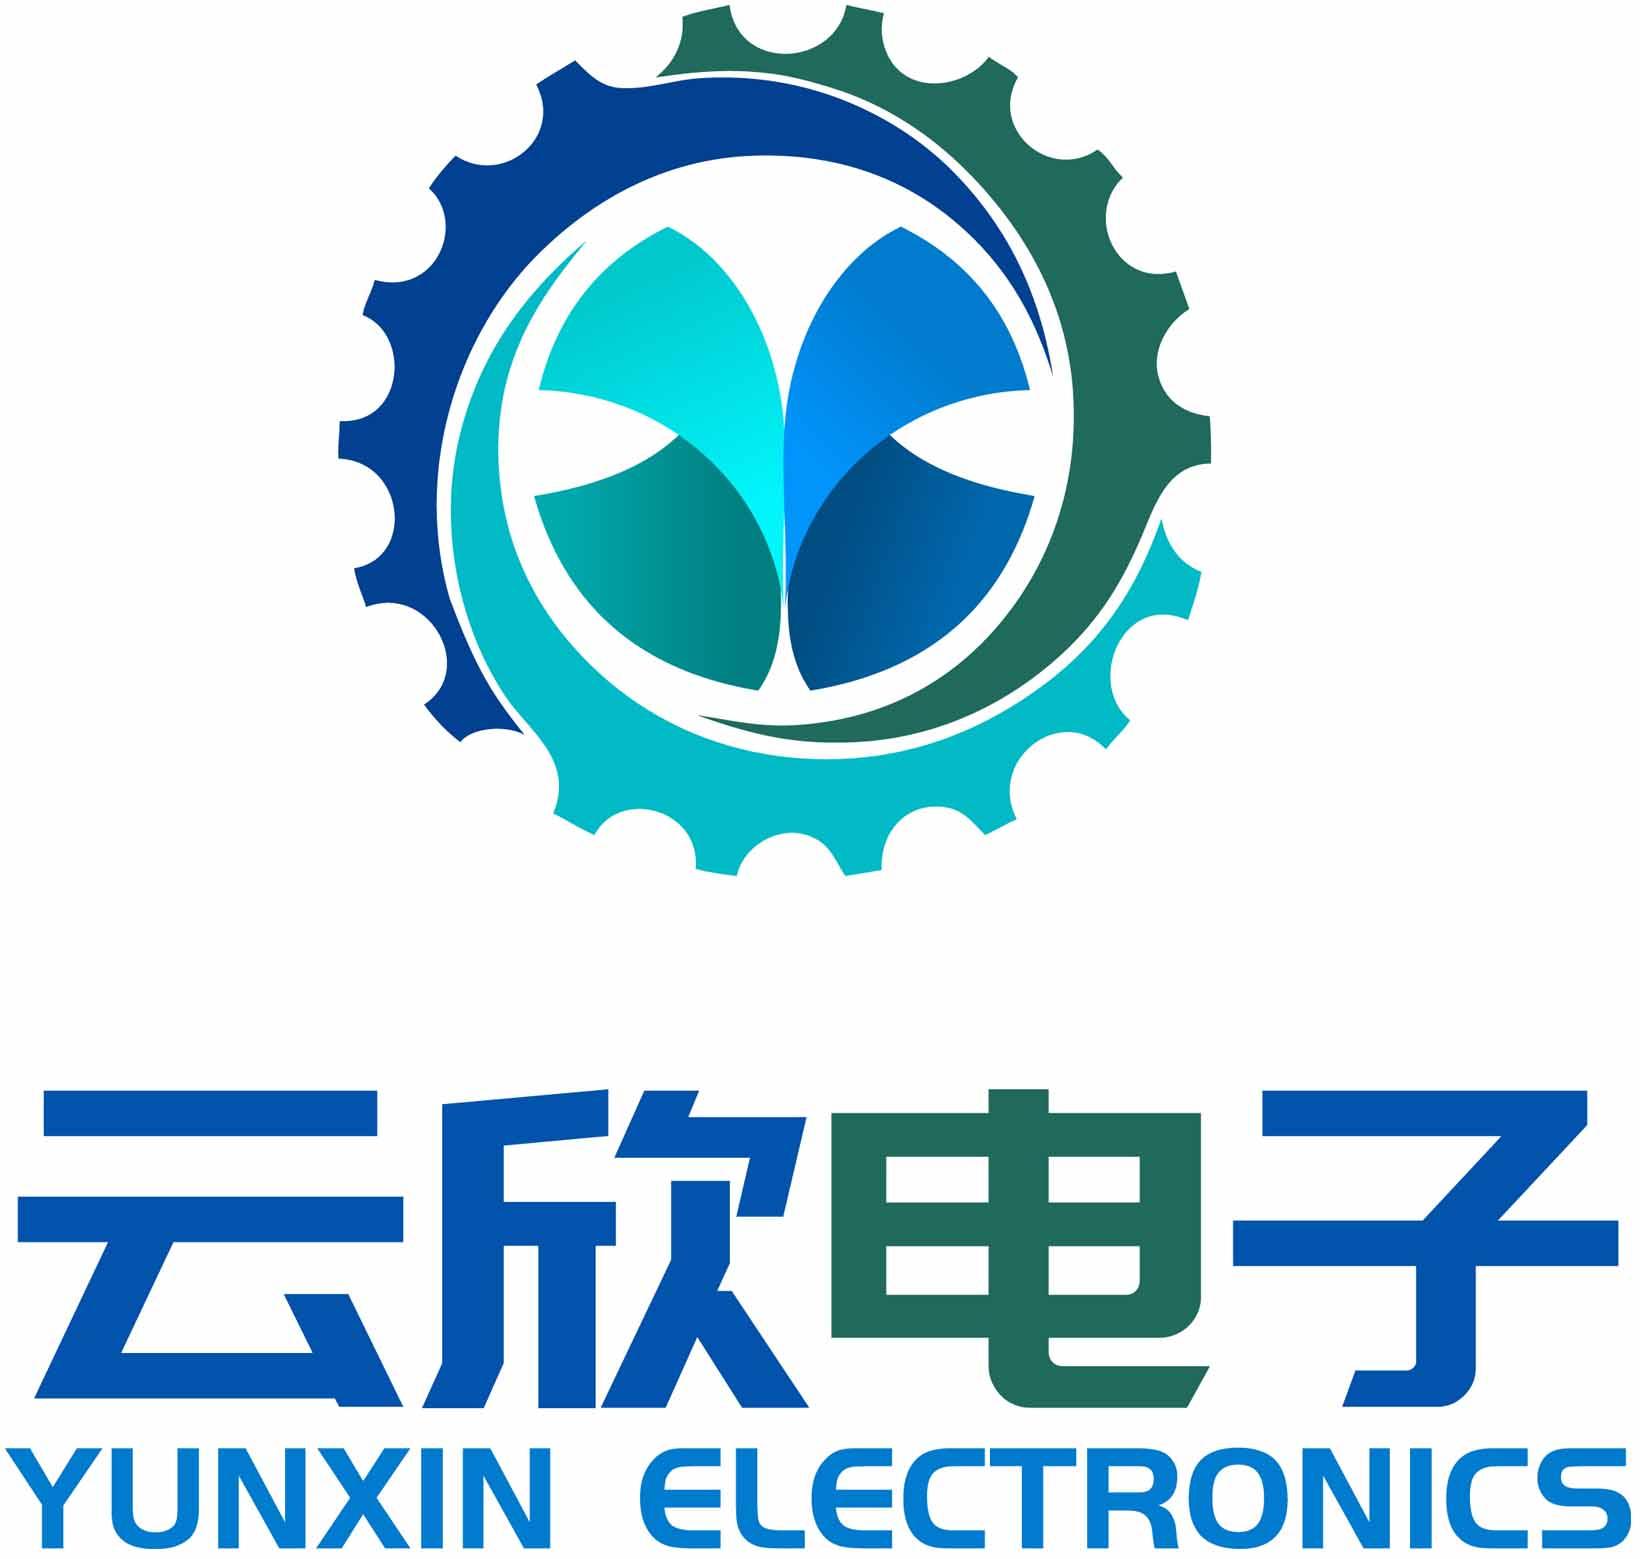 https://static.bjx.com.cn/company-other/2018/06/20/2018062011240205_956247.jpg?x-oss-process=image/resize,w_120,h_120